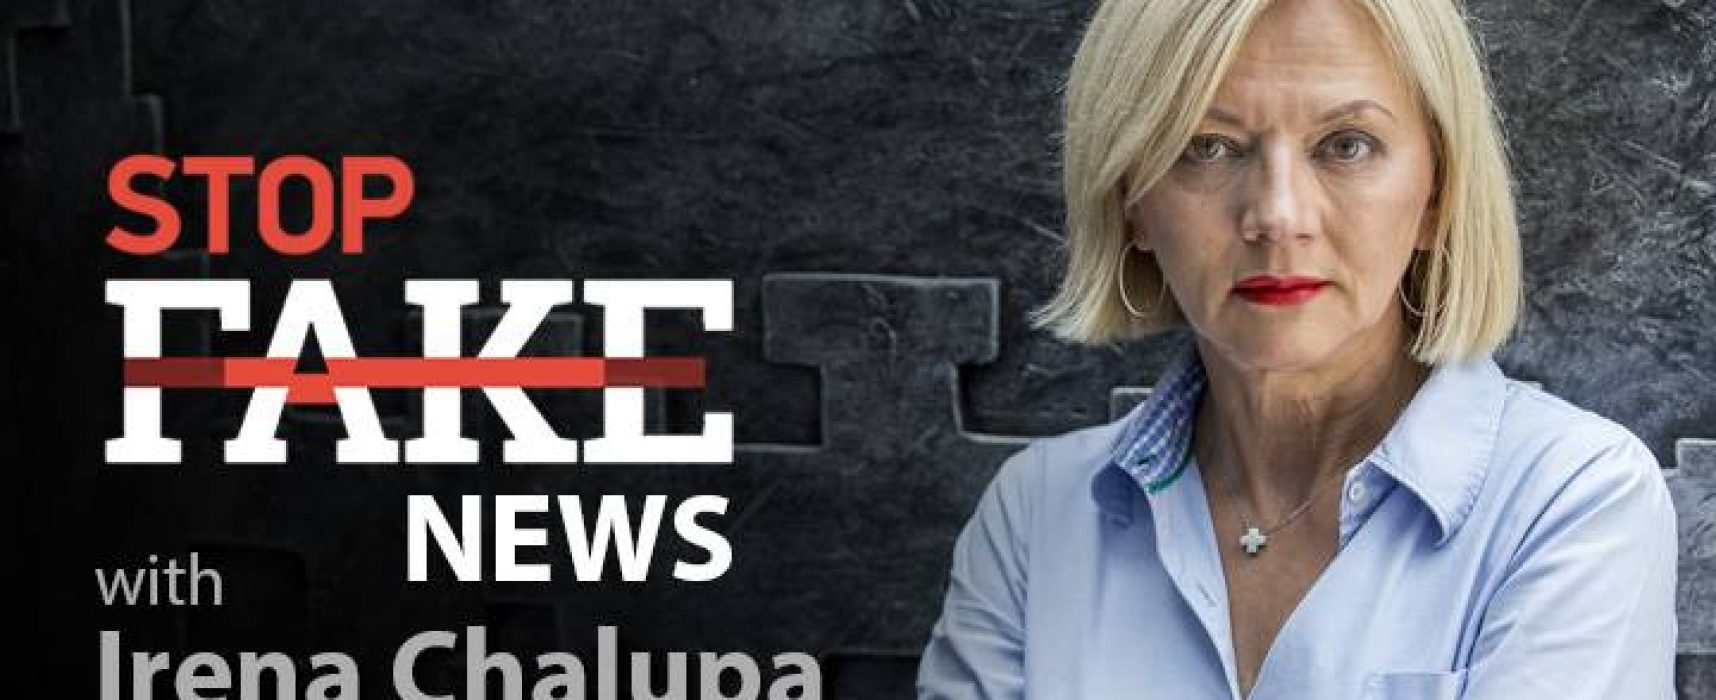 StopFakeNews #88 with Irena Chalupa